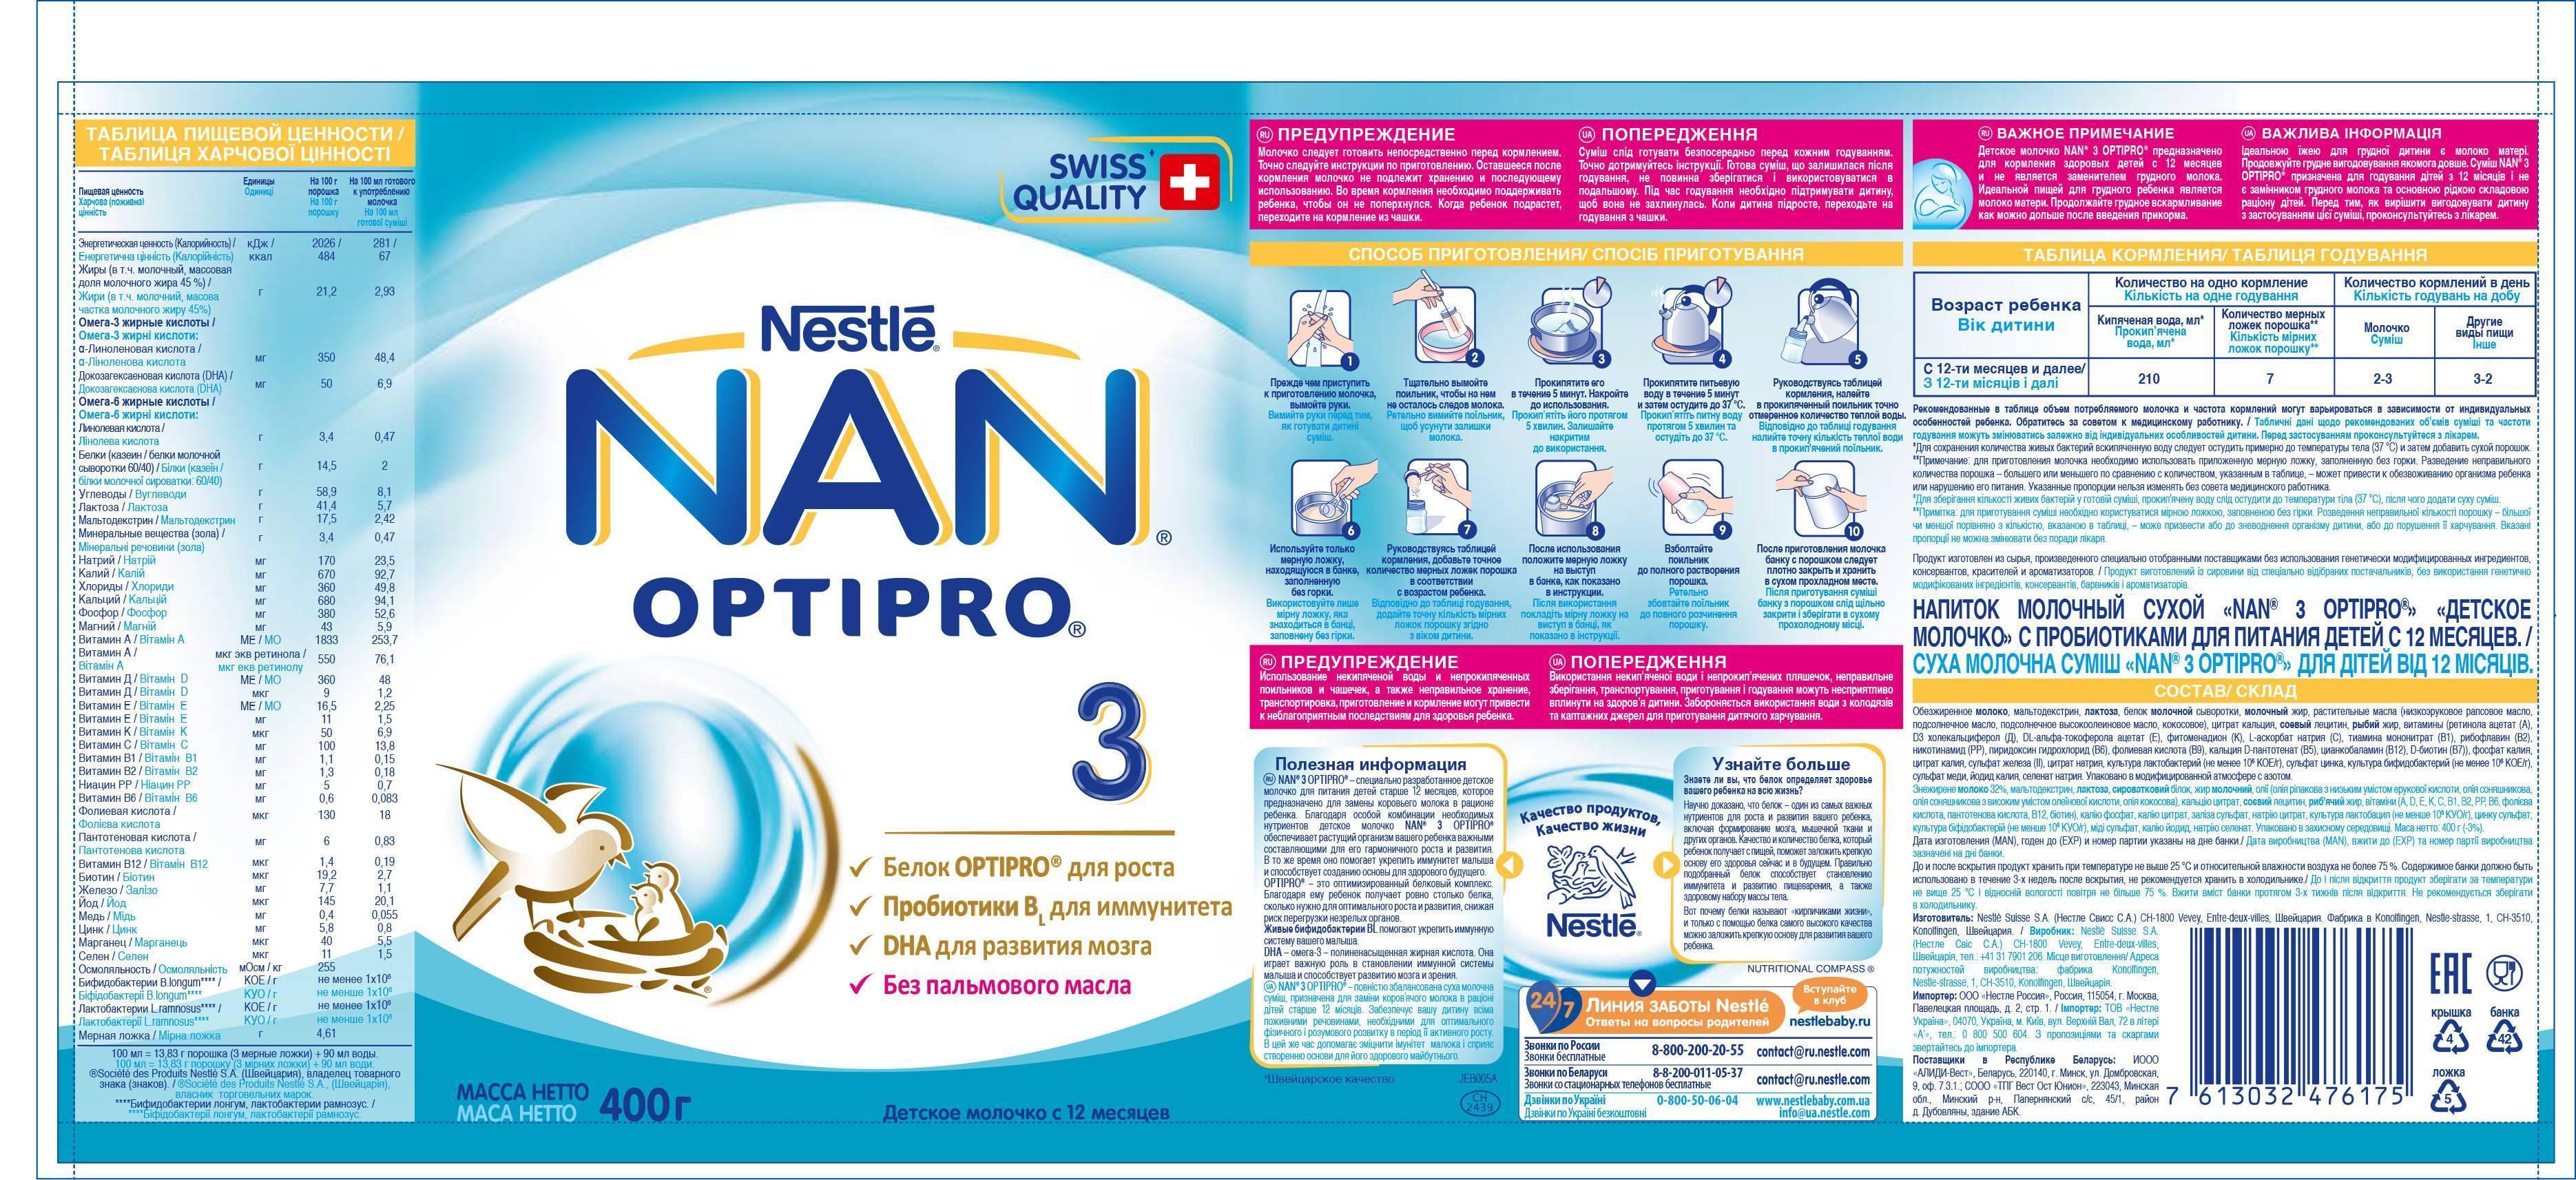 Nan® 4optipro®